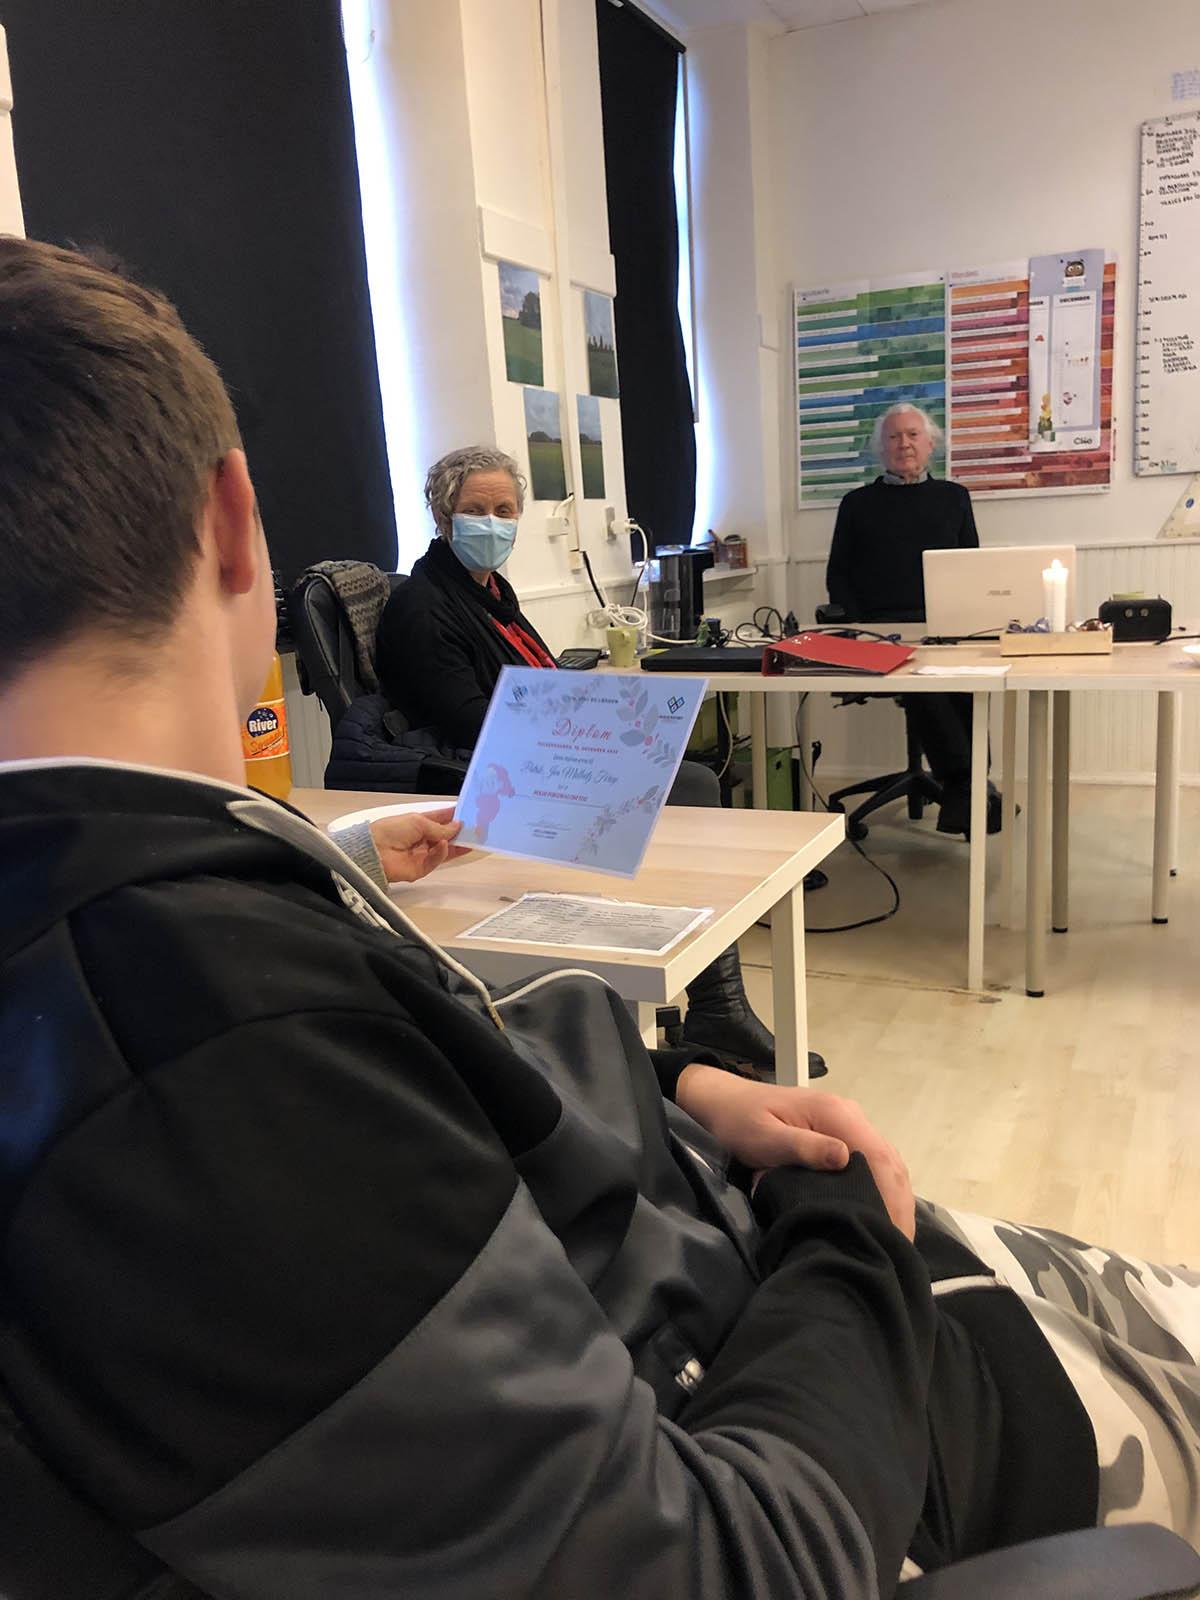 Eksamenstræning i udskolingen · Turboforløb